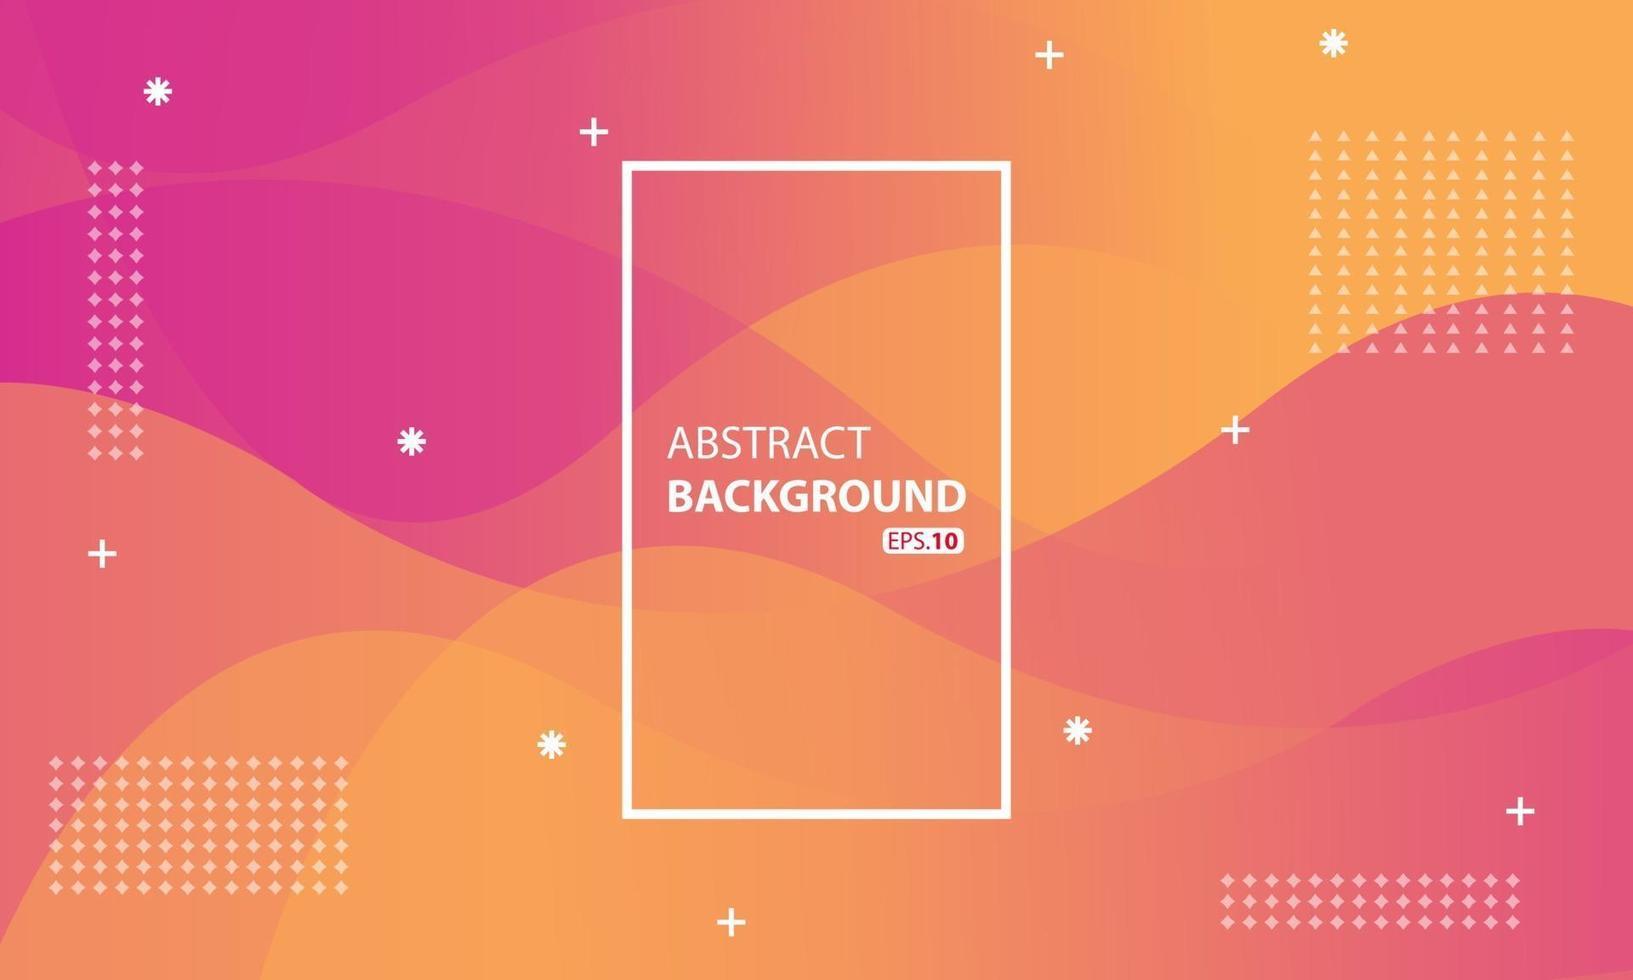 rosa och orange flytande färgbakgrund. vågig geometrisk bakgrund. dynamisk strukturerad geometrisk elementdesign. vektor